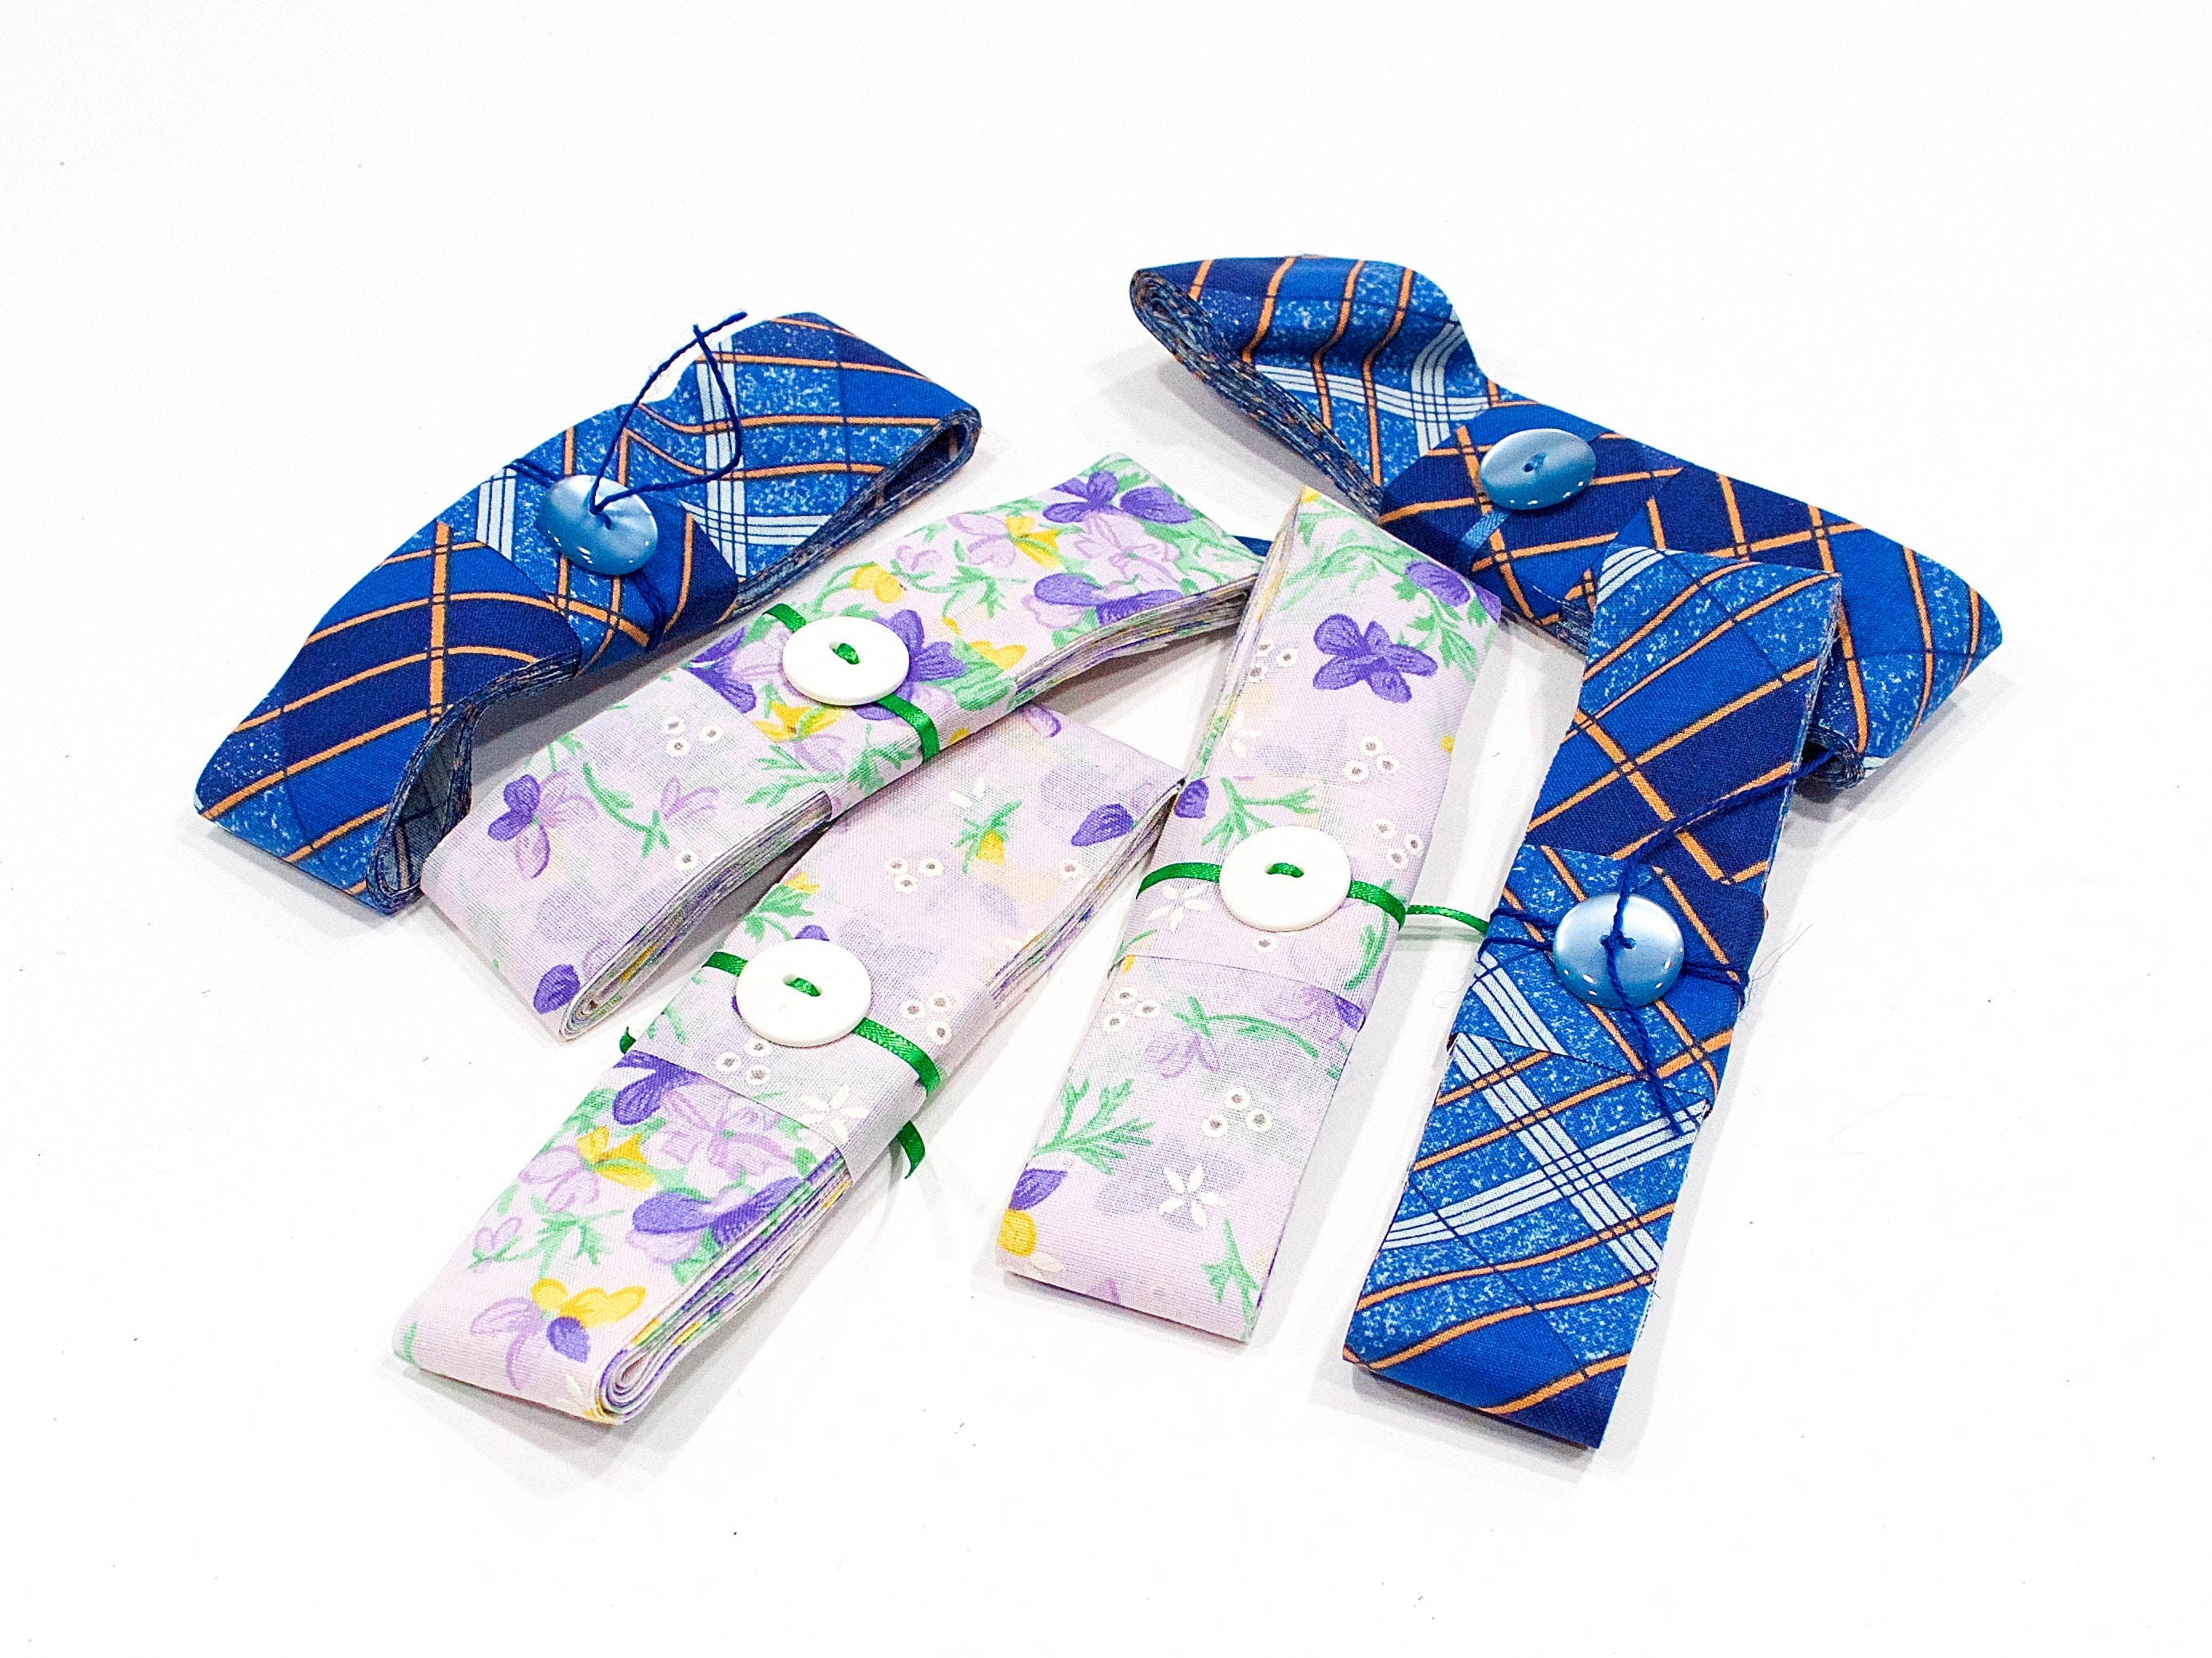 VINTAGE: Total tissu de 30 verges de tissu Total ruban - artisanat - cadeau - ruban de Lewis 1.25